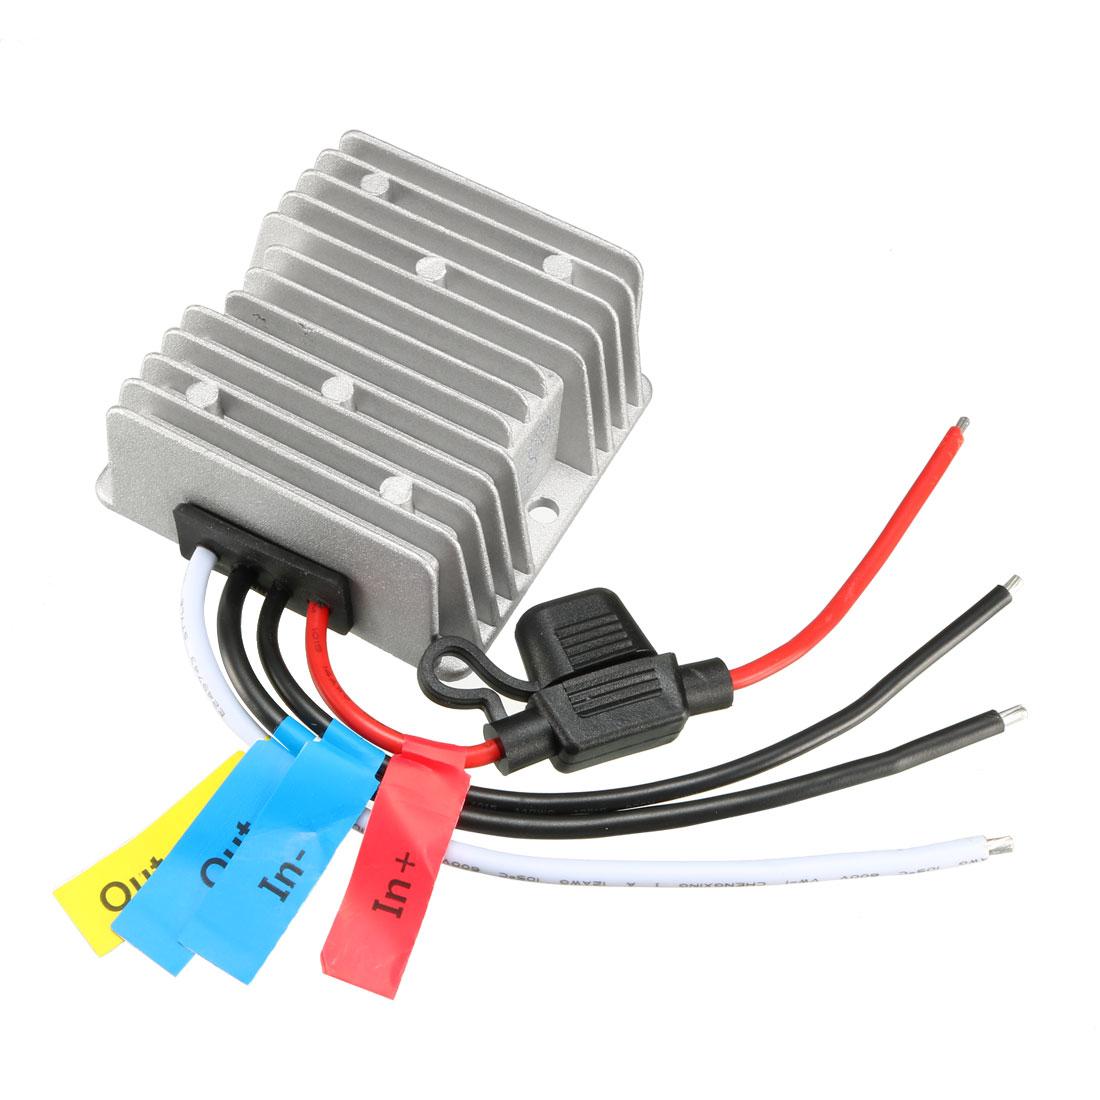 uxcell Power Converter Regulator DC12V/24V Step-Down to DC6V 25A 150W Waterproof Voltage Convert Transformer